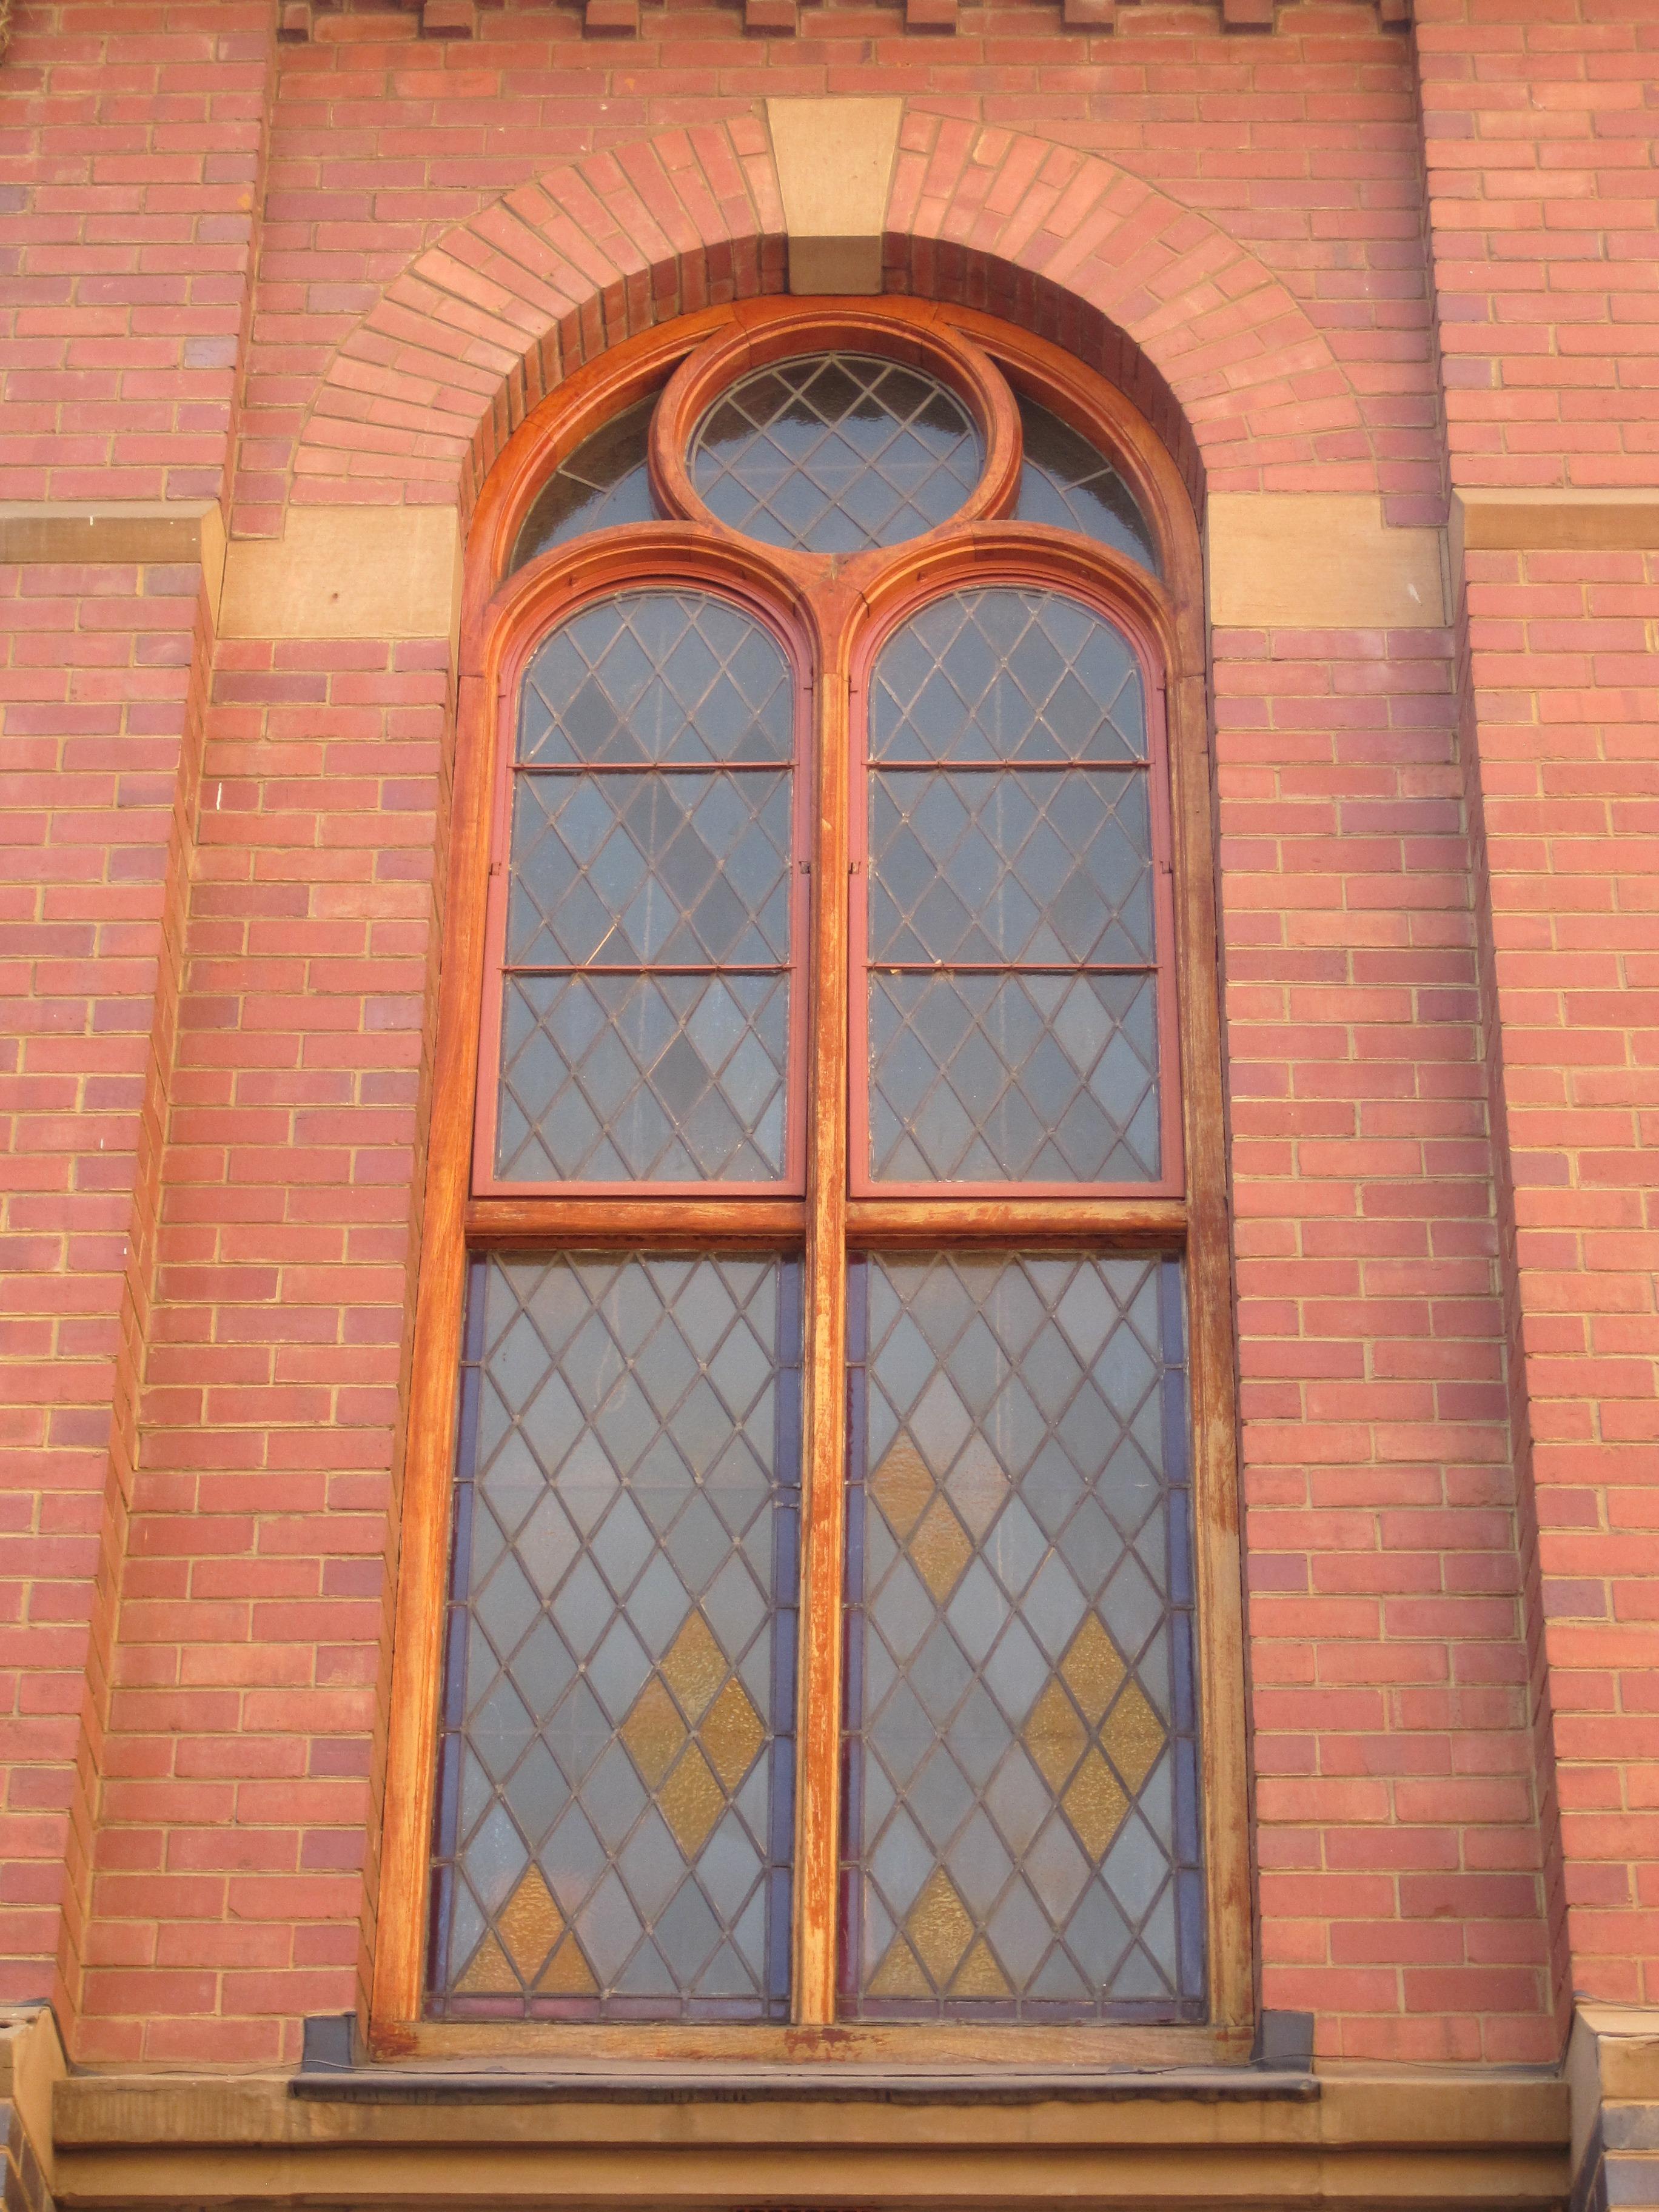 Fotos Gratis Arquitectura Madera Edificio Pared Arco